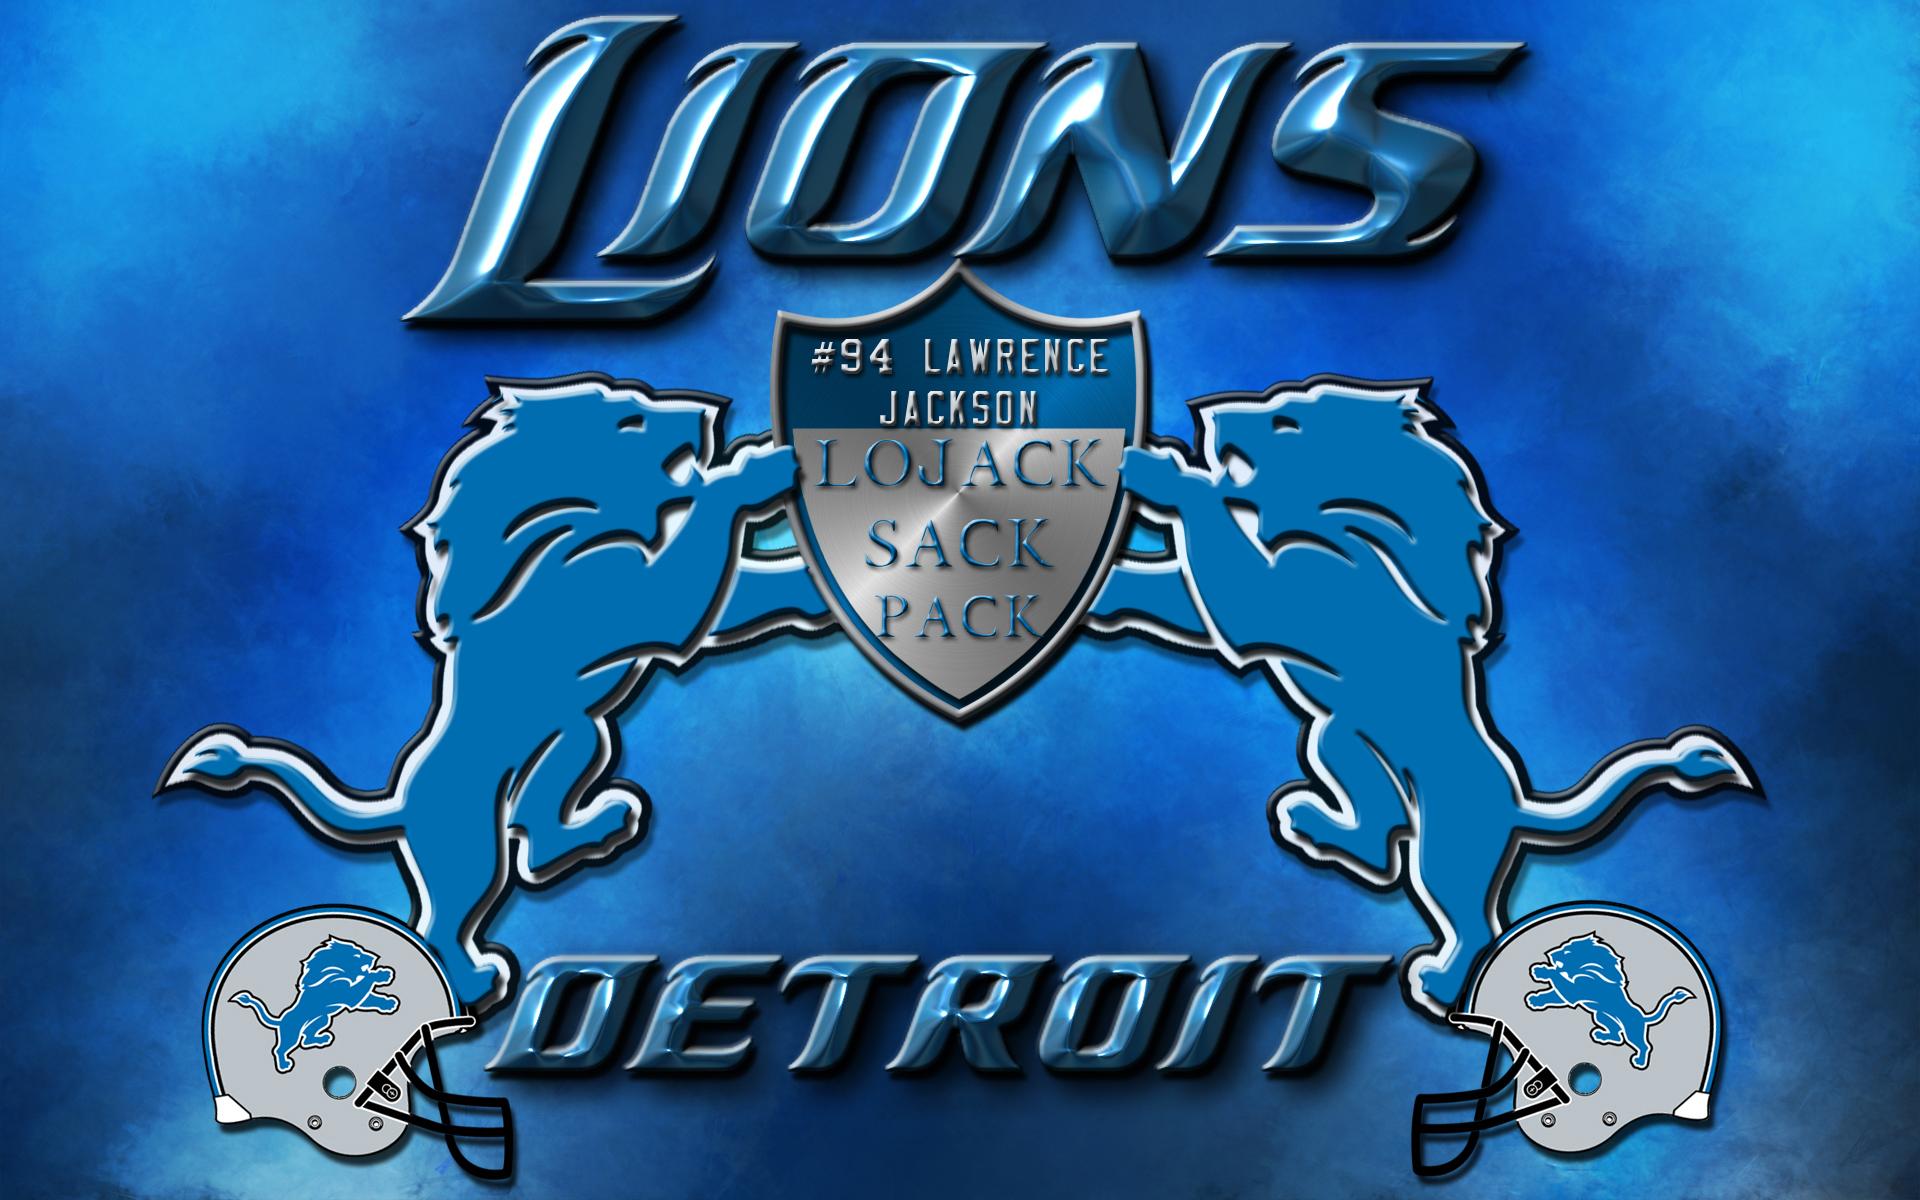 Calvin Johnson Hd Wallpaper Detroit Lions Images Download Free Pixelstalk Net